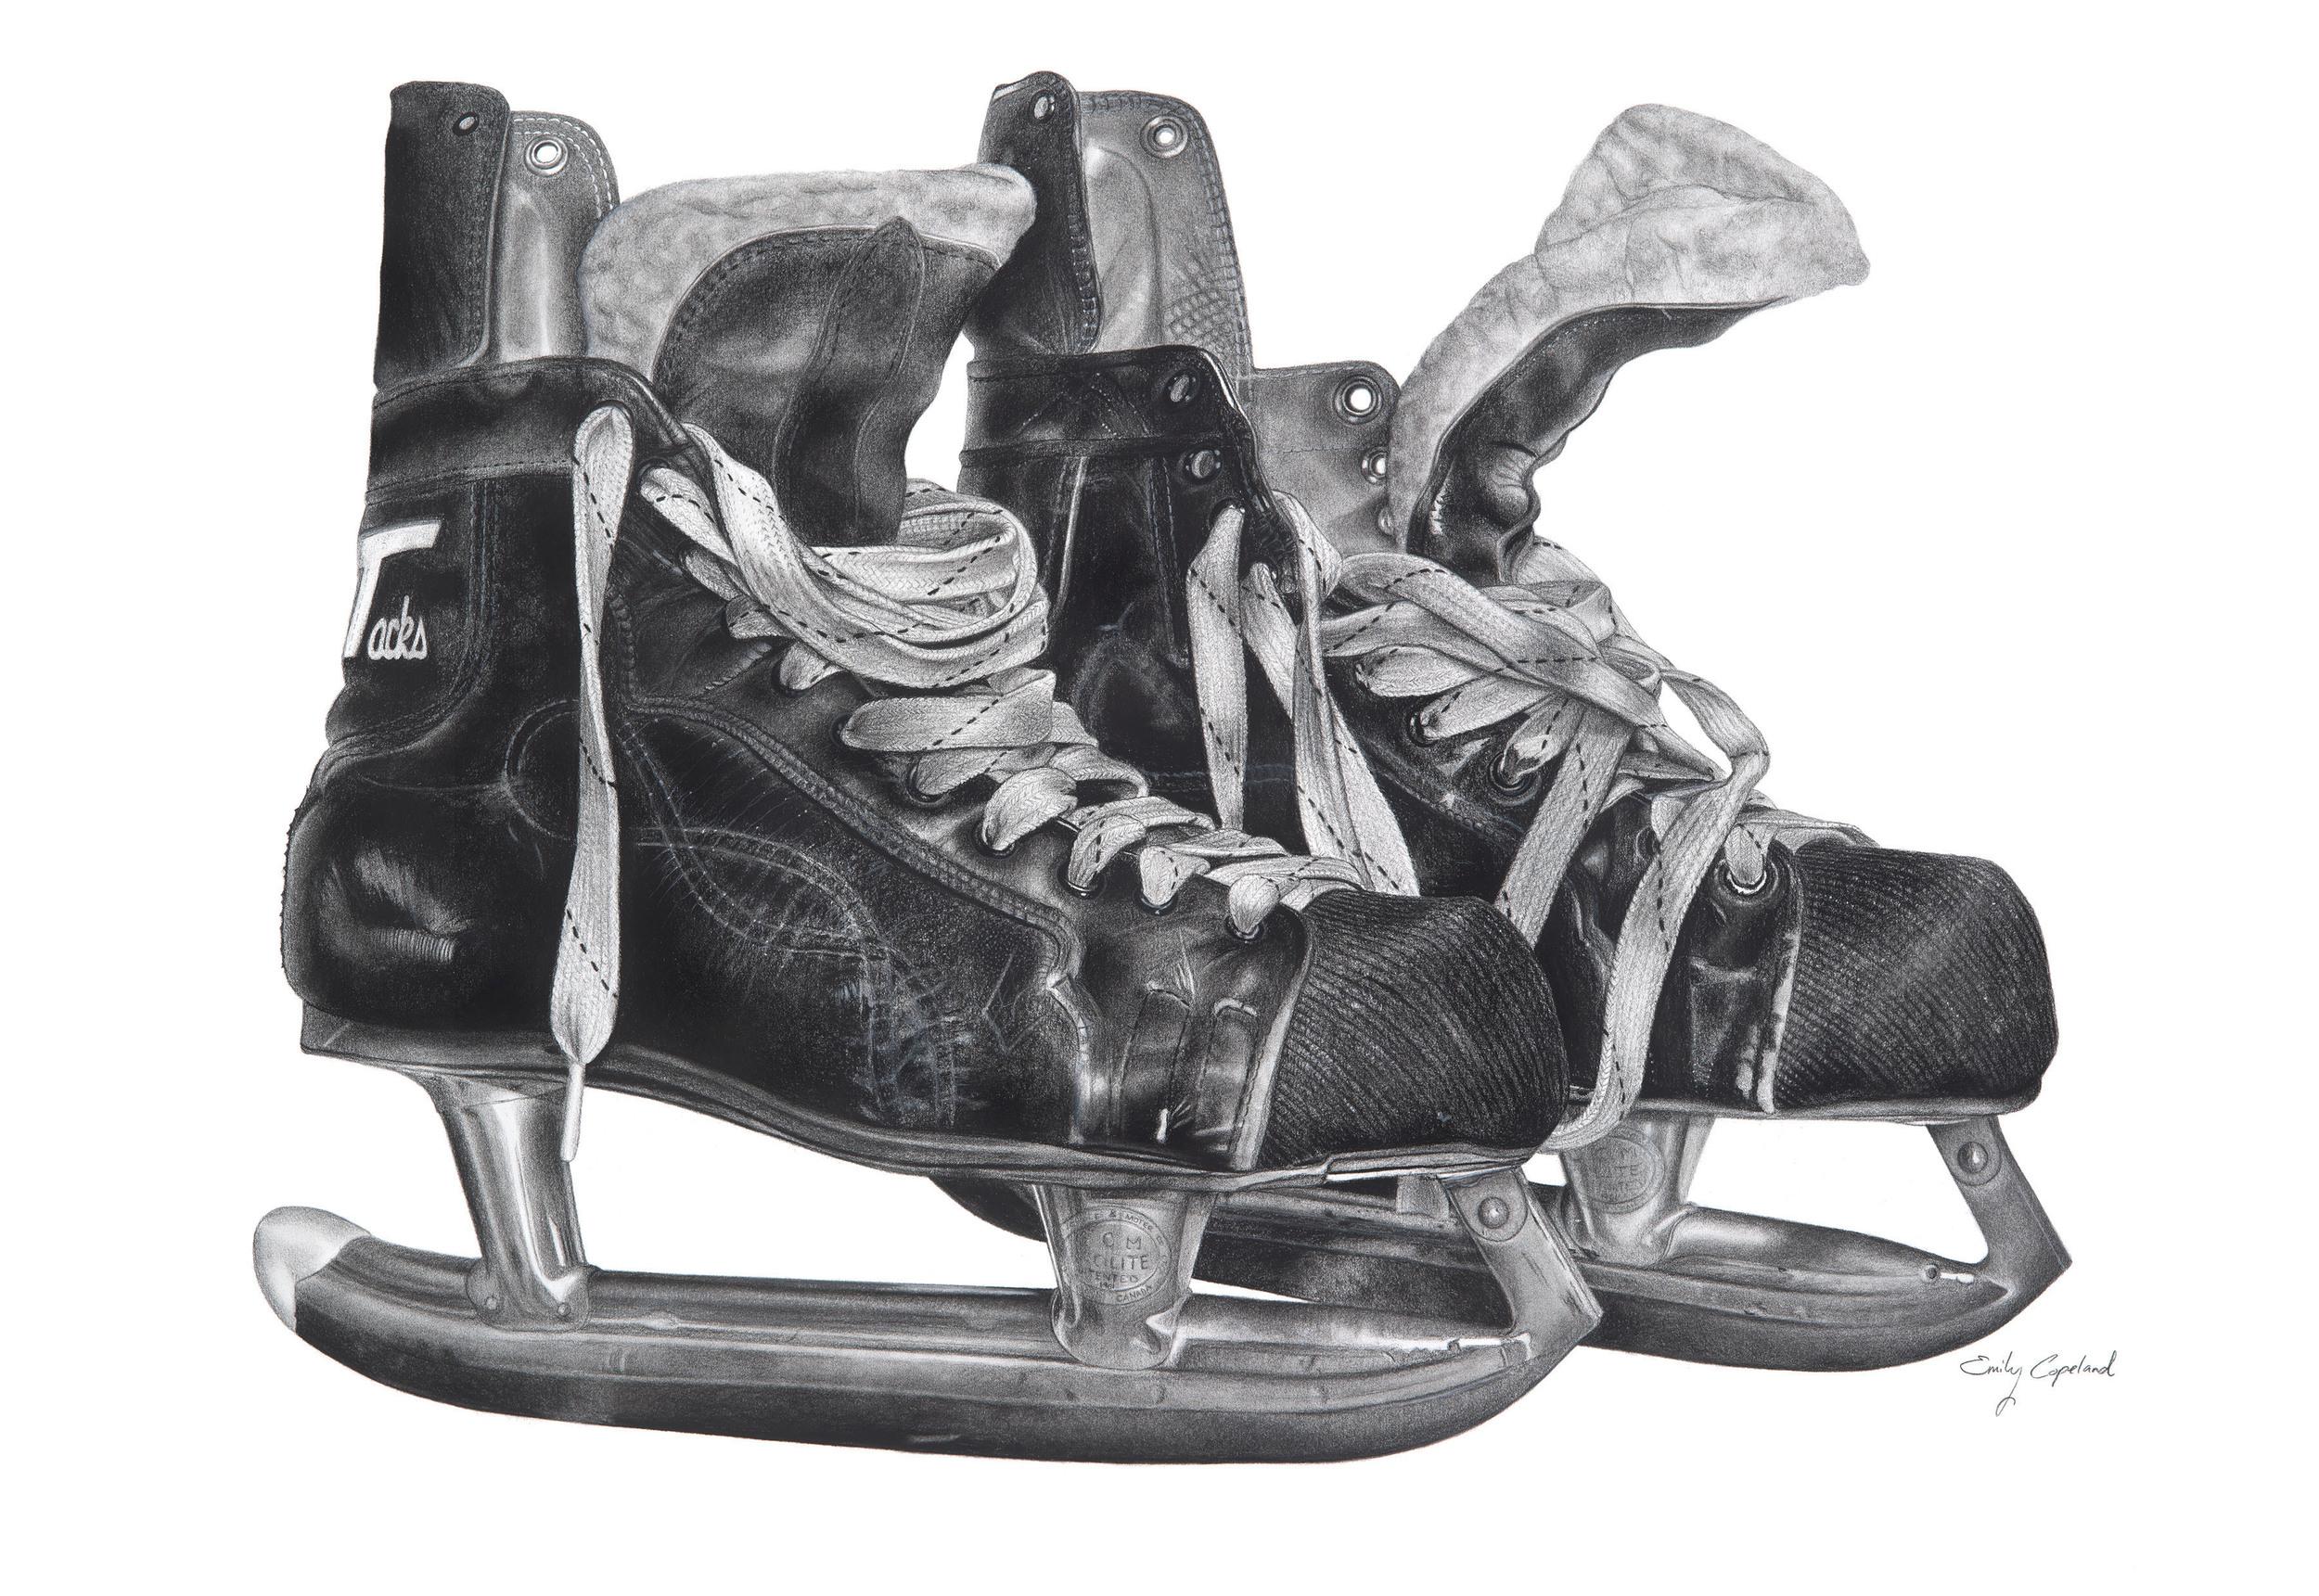 Charcoal Drawing of Vintage Hockey Skates